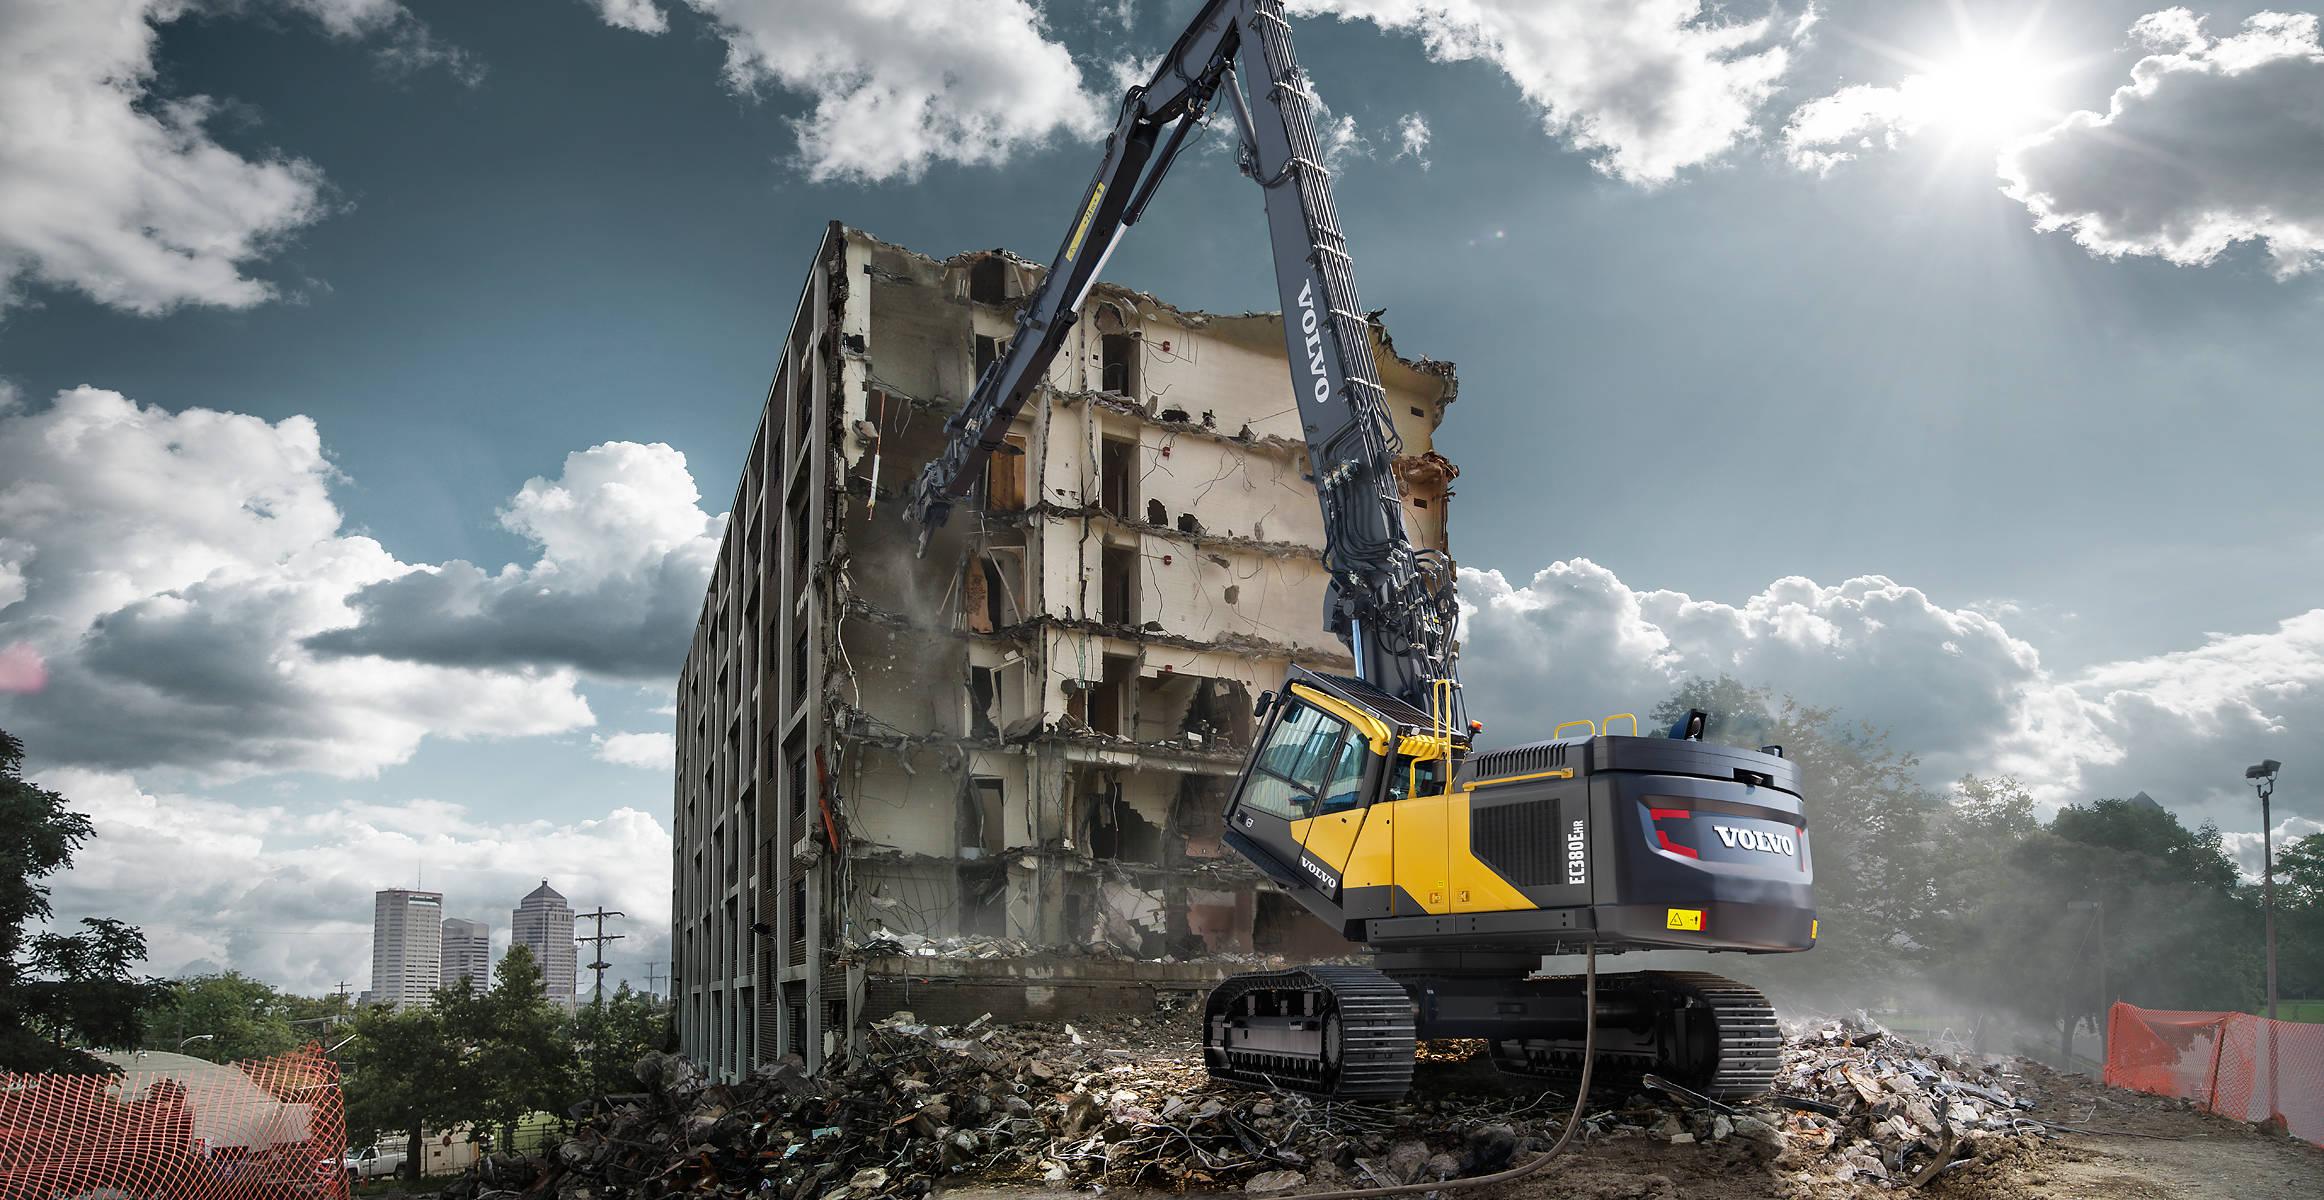 Demolition Equipment | EC380E HR | Overview